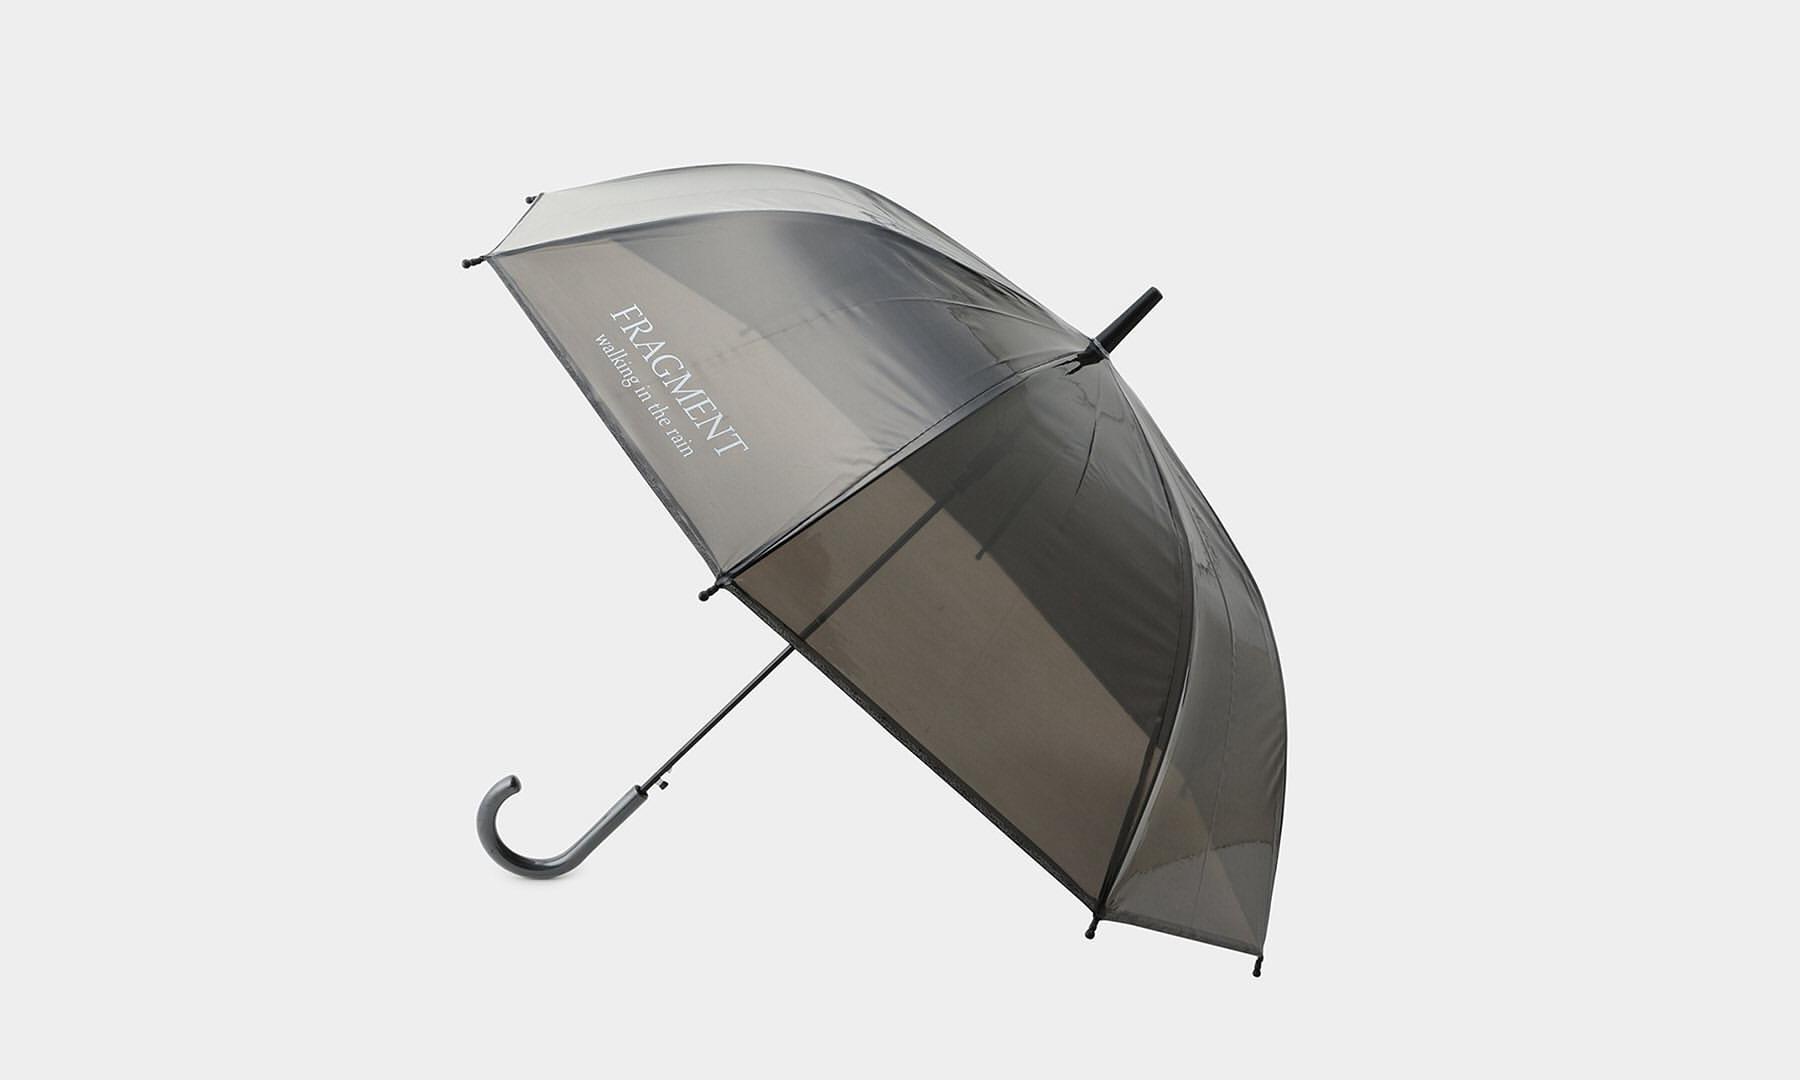 迎接梅雨季节,THE CONVENI 推出「fragment umbrella」周边